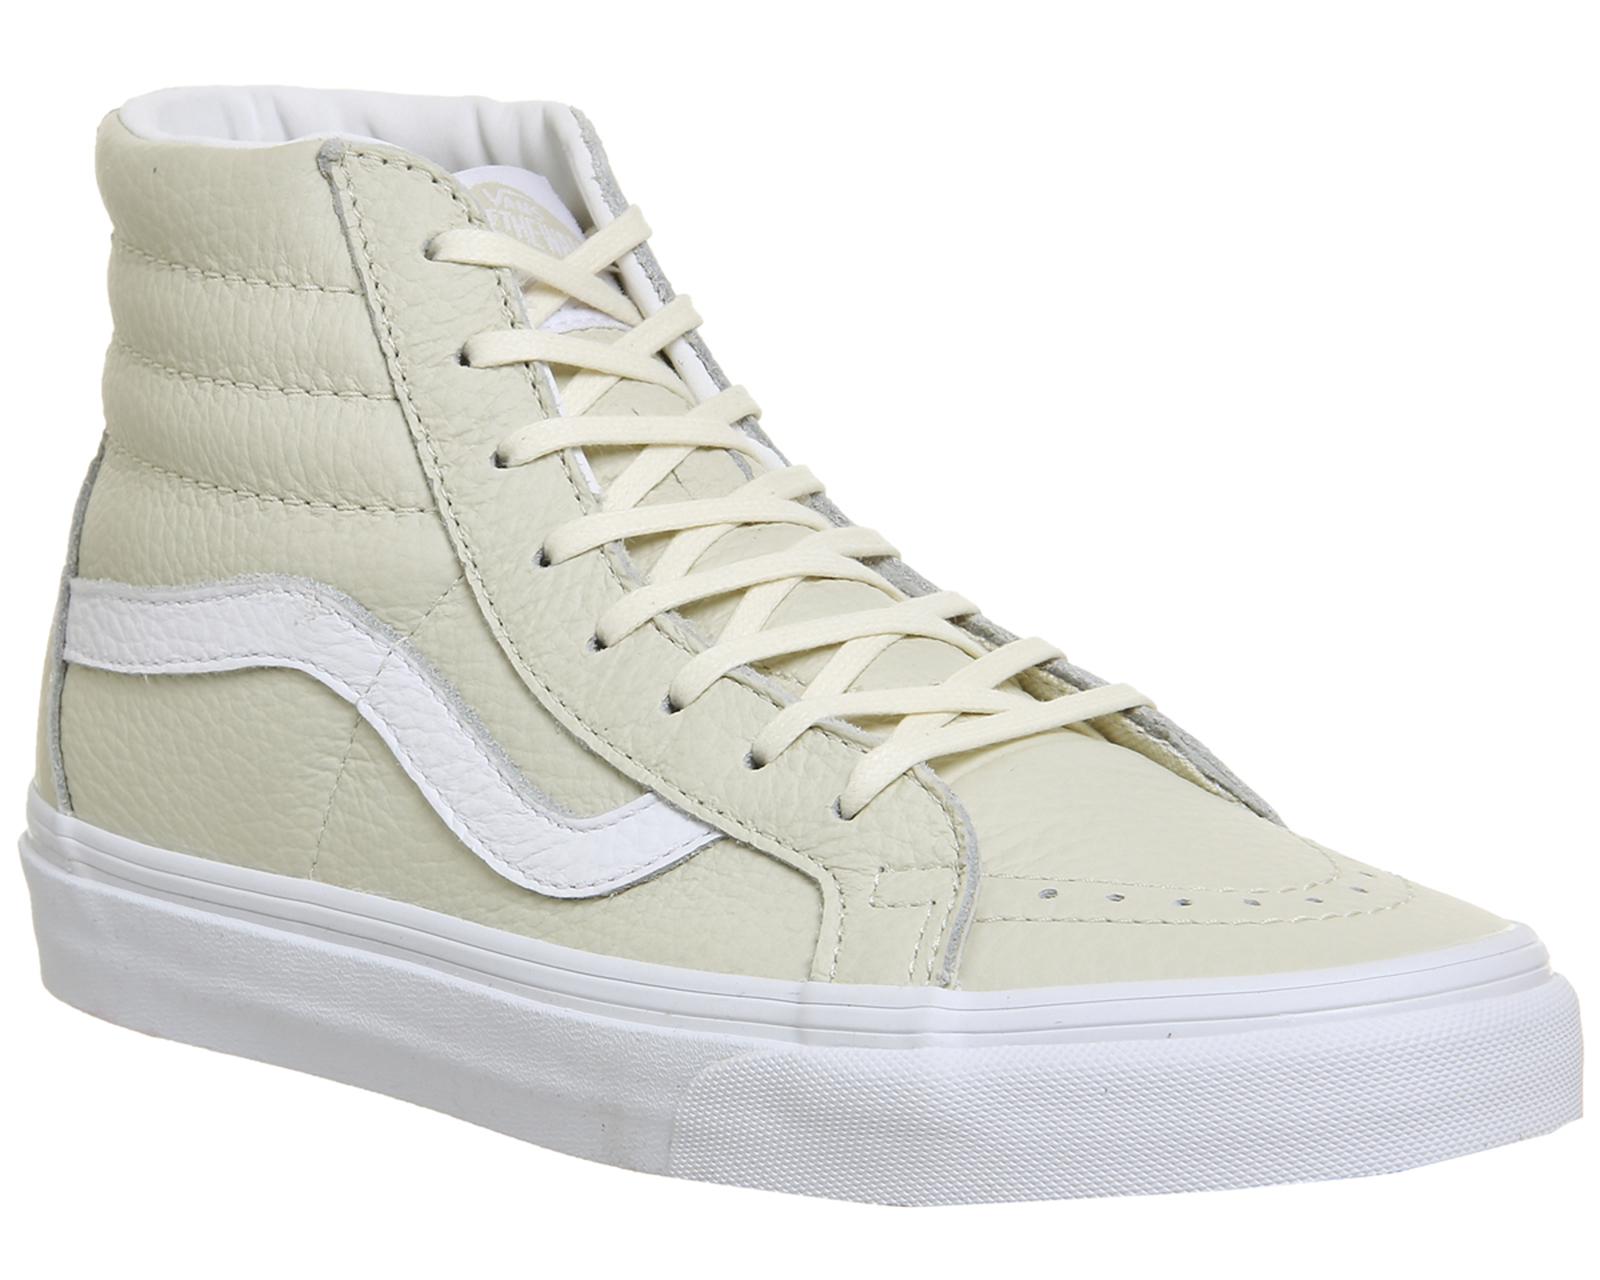 22a9b995e2d Sentinel Womens Vans Sk8 Hi Reissue Turteldove White Trainers Shoes